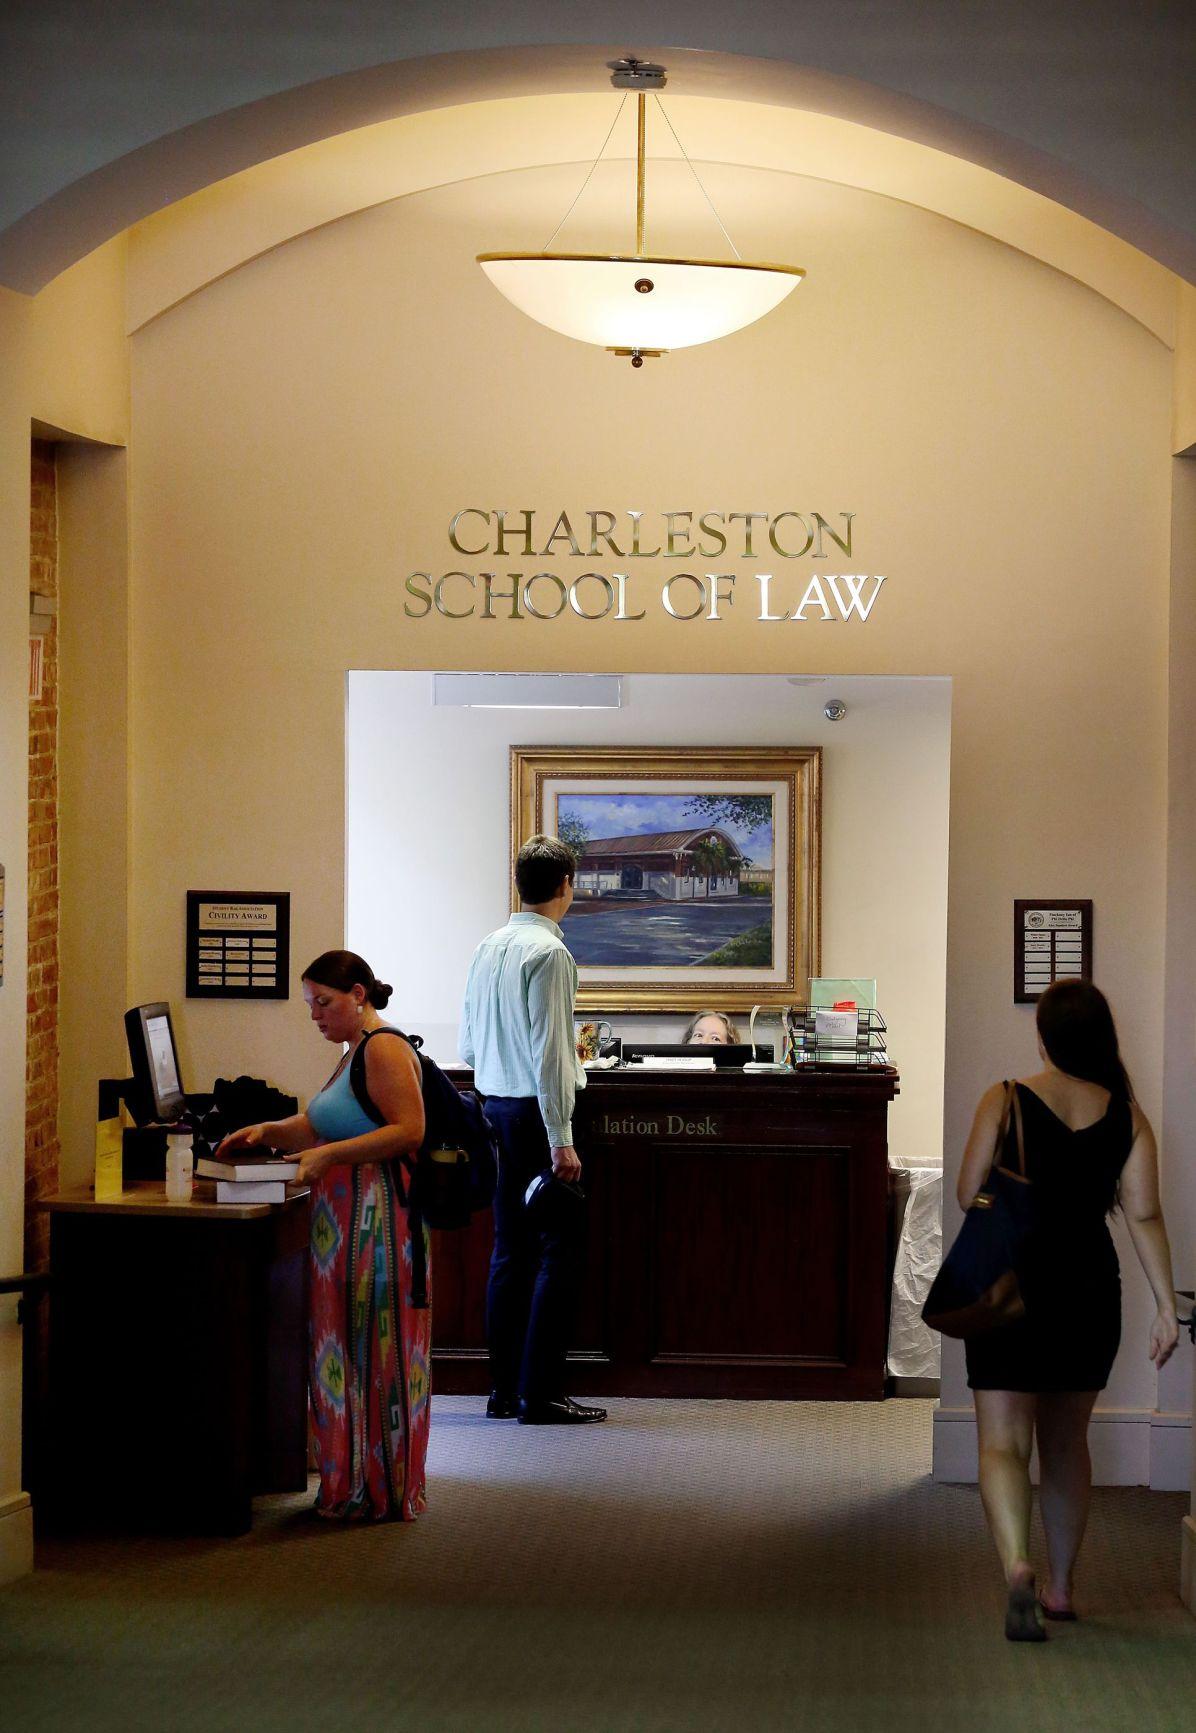 Charleston School of Law future still unclear